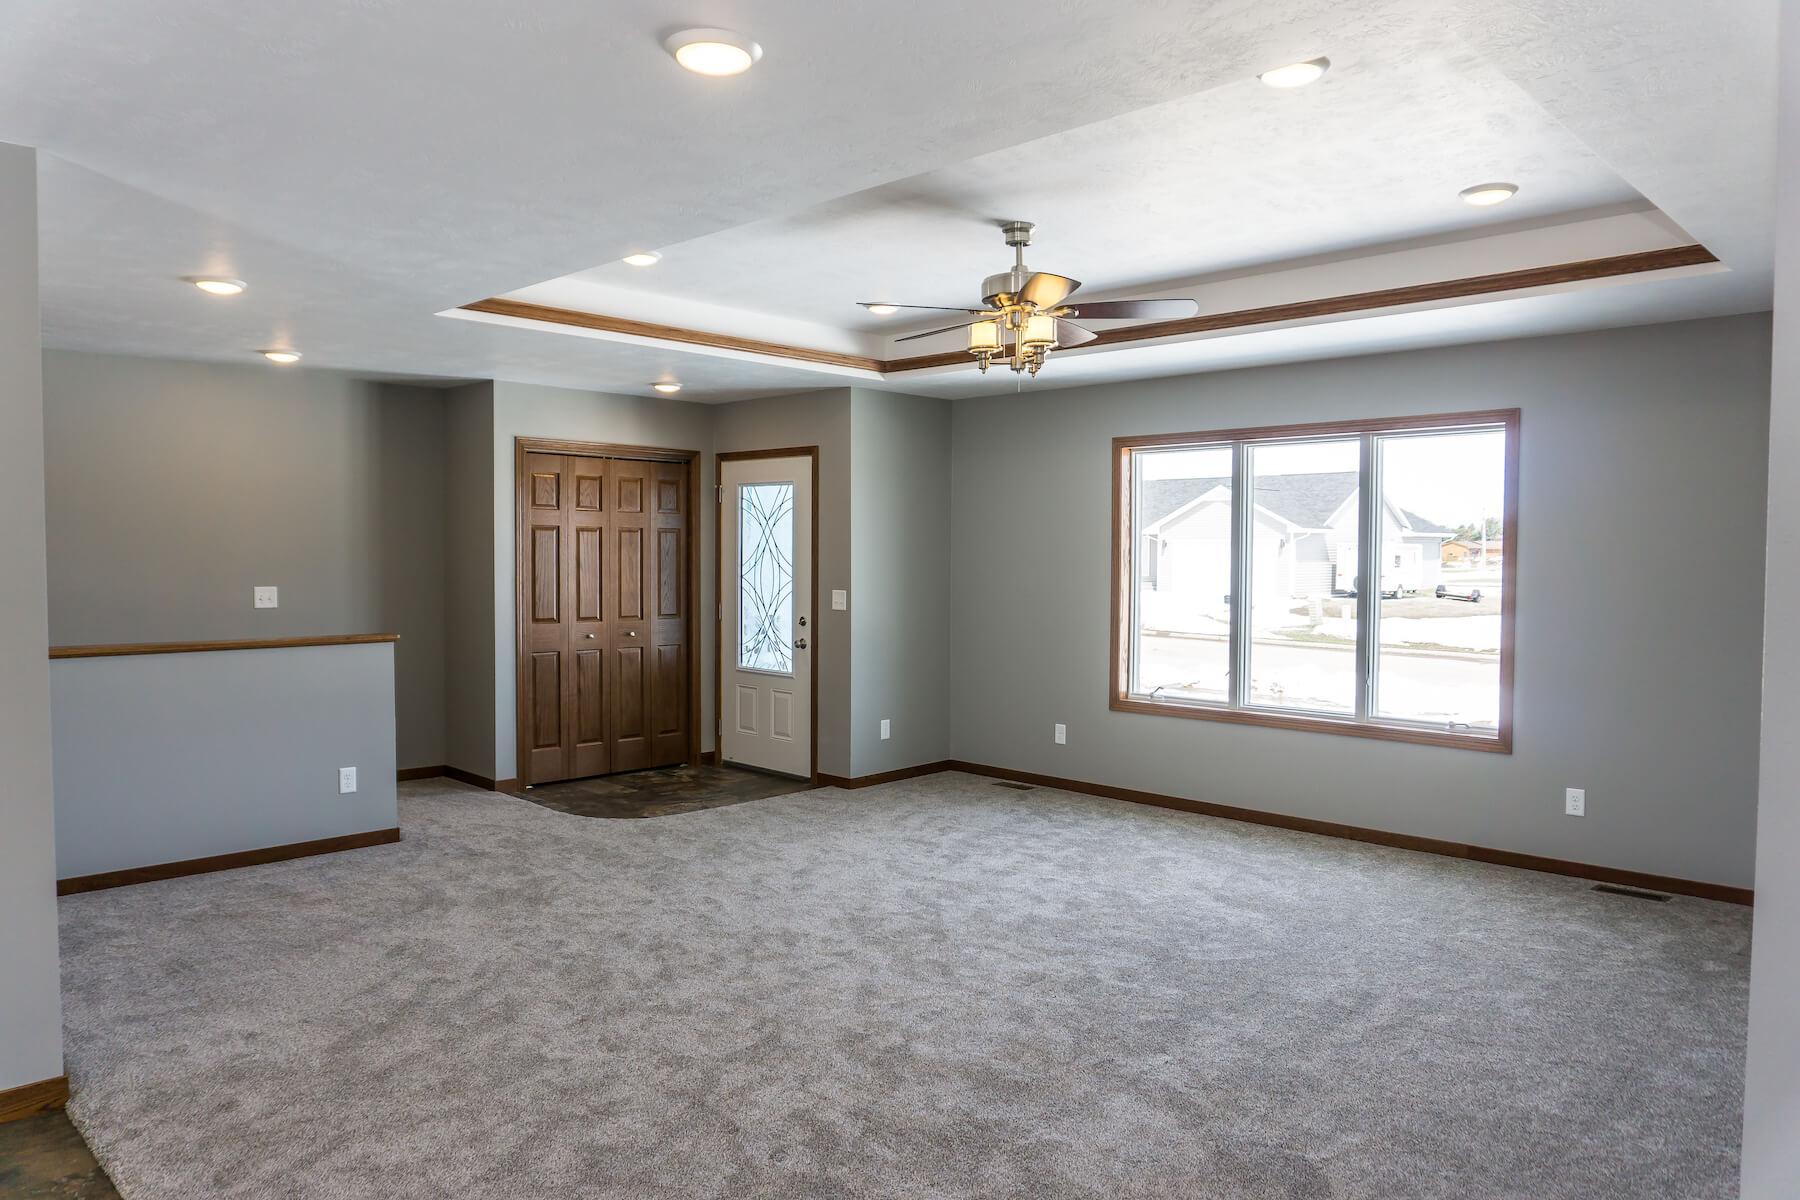 2019-4-12 Kemper Avenue Builders FirstSource Compressed  21.jpg